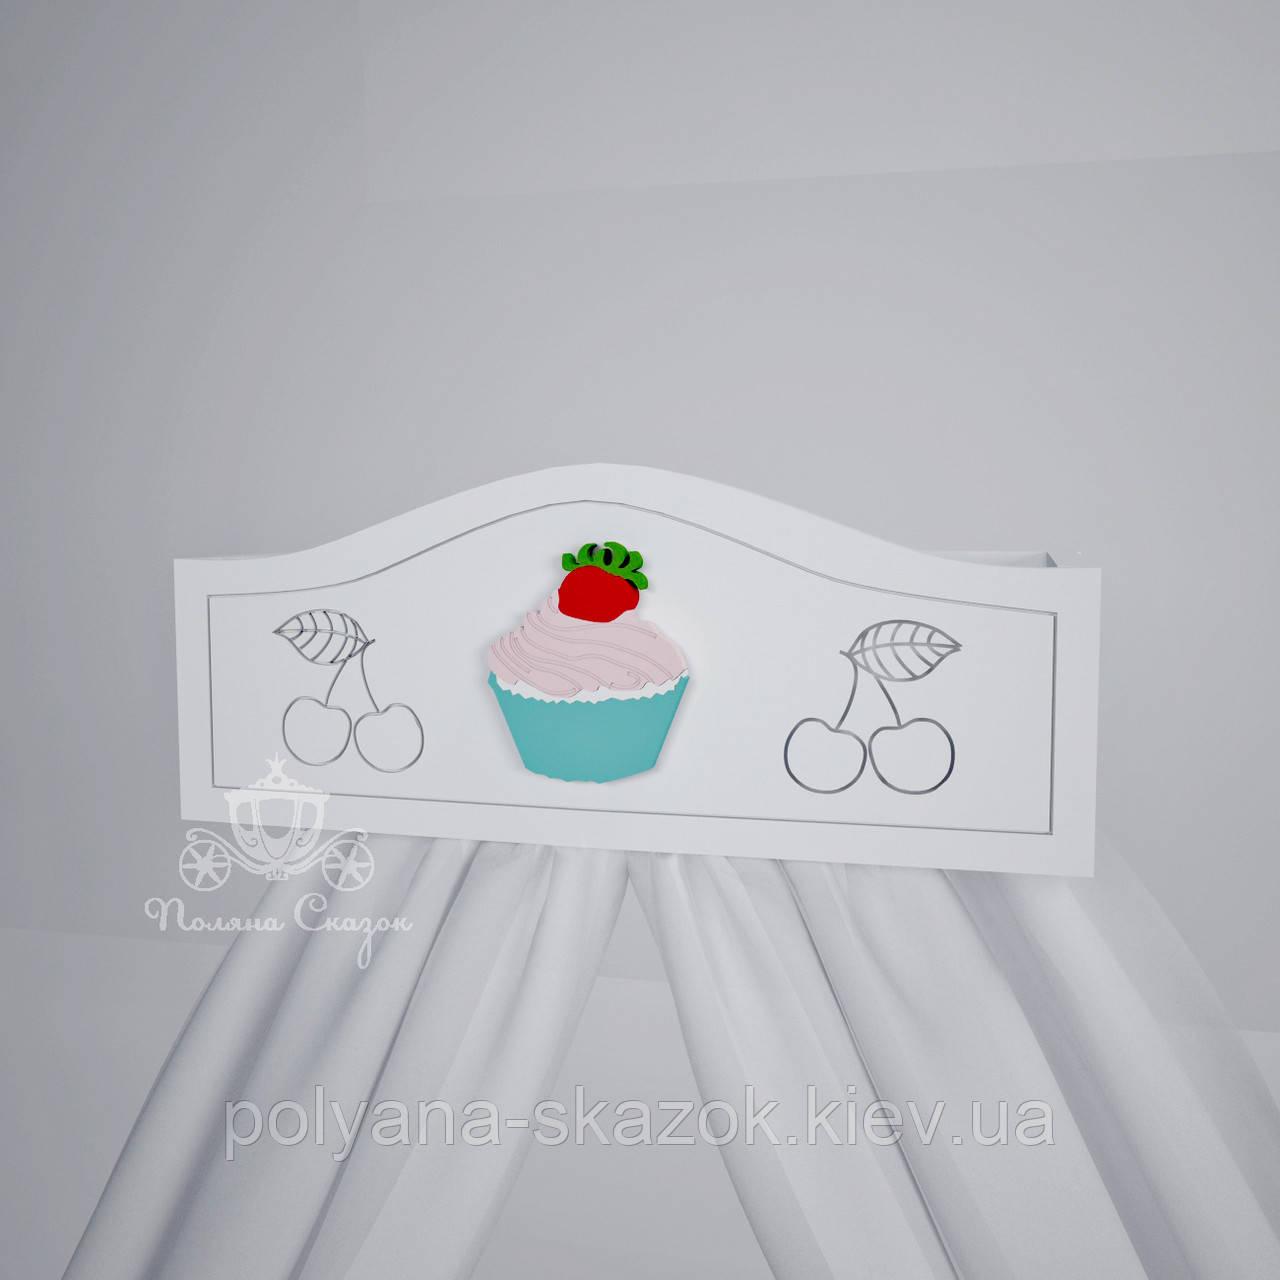 "Держатель под балдахин ""The cake"", фото 1"